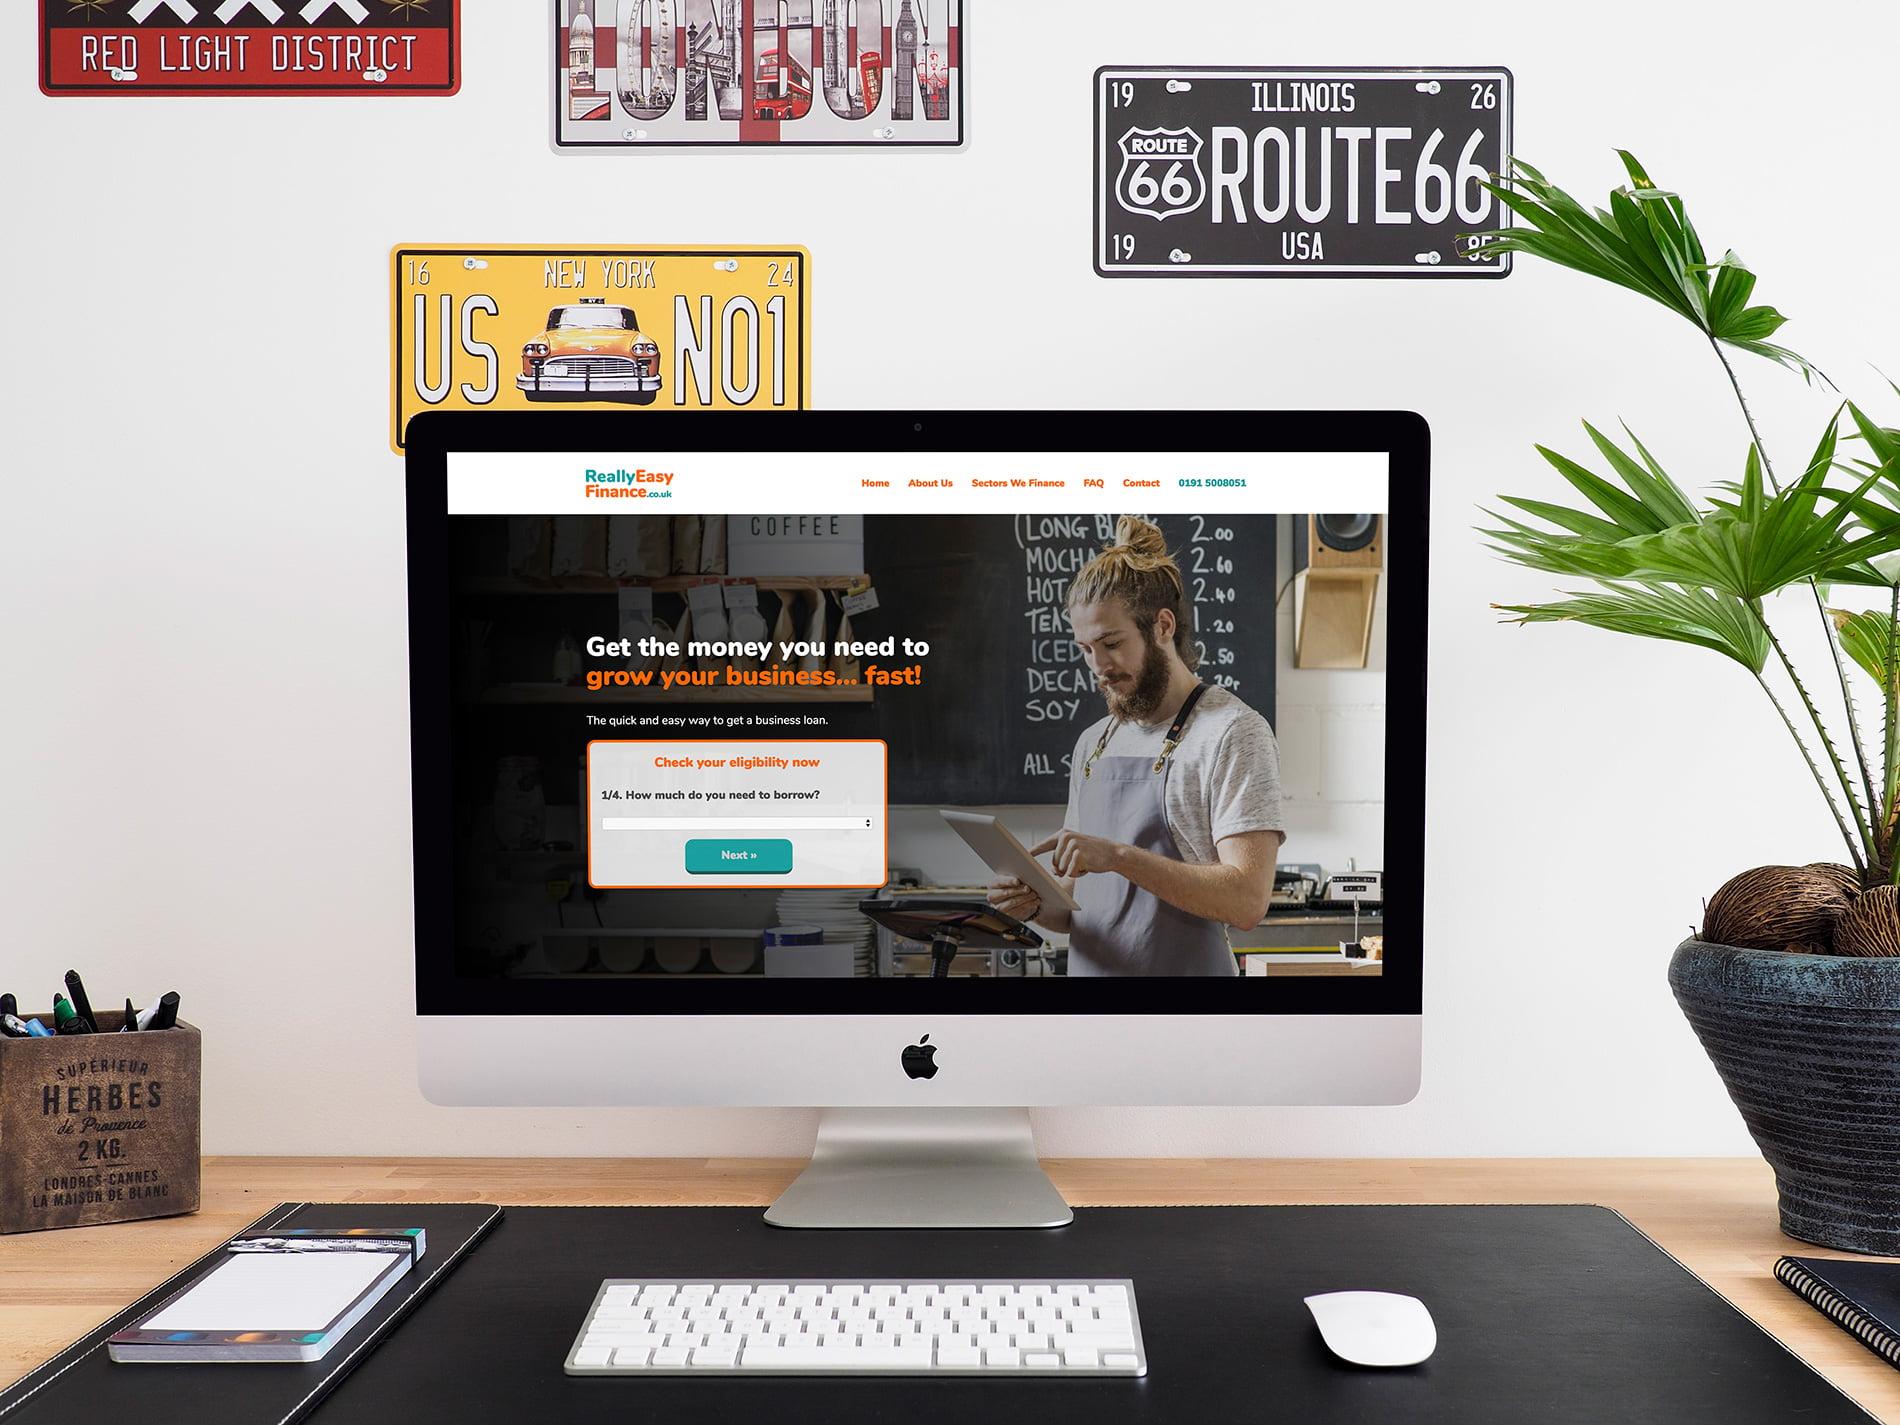 Really Easy Finance website displayed on a desktop computer